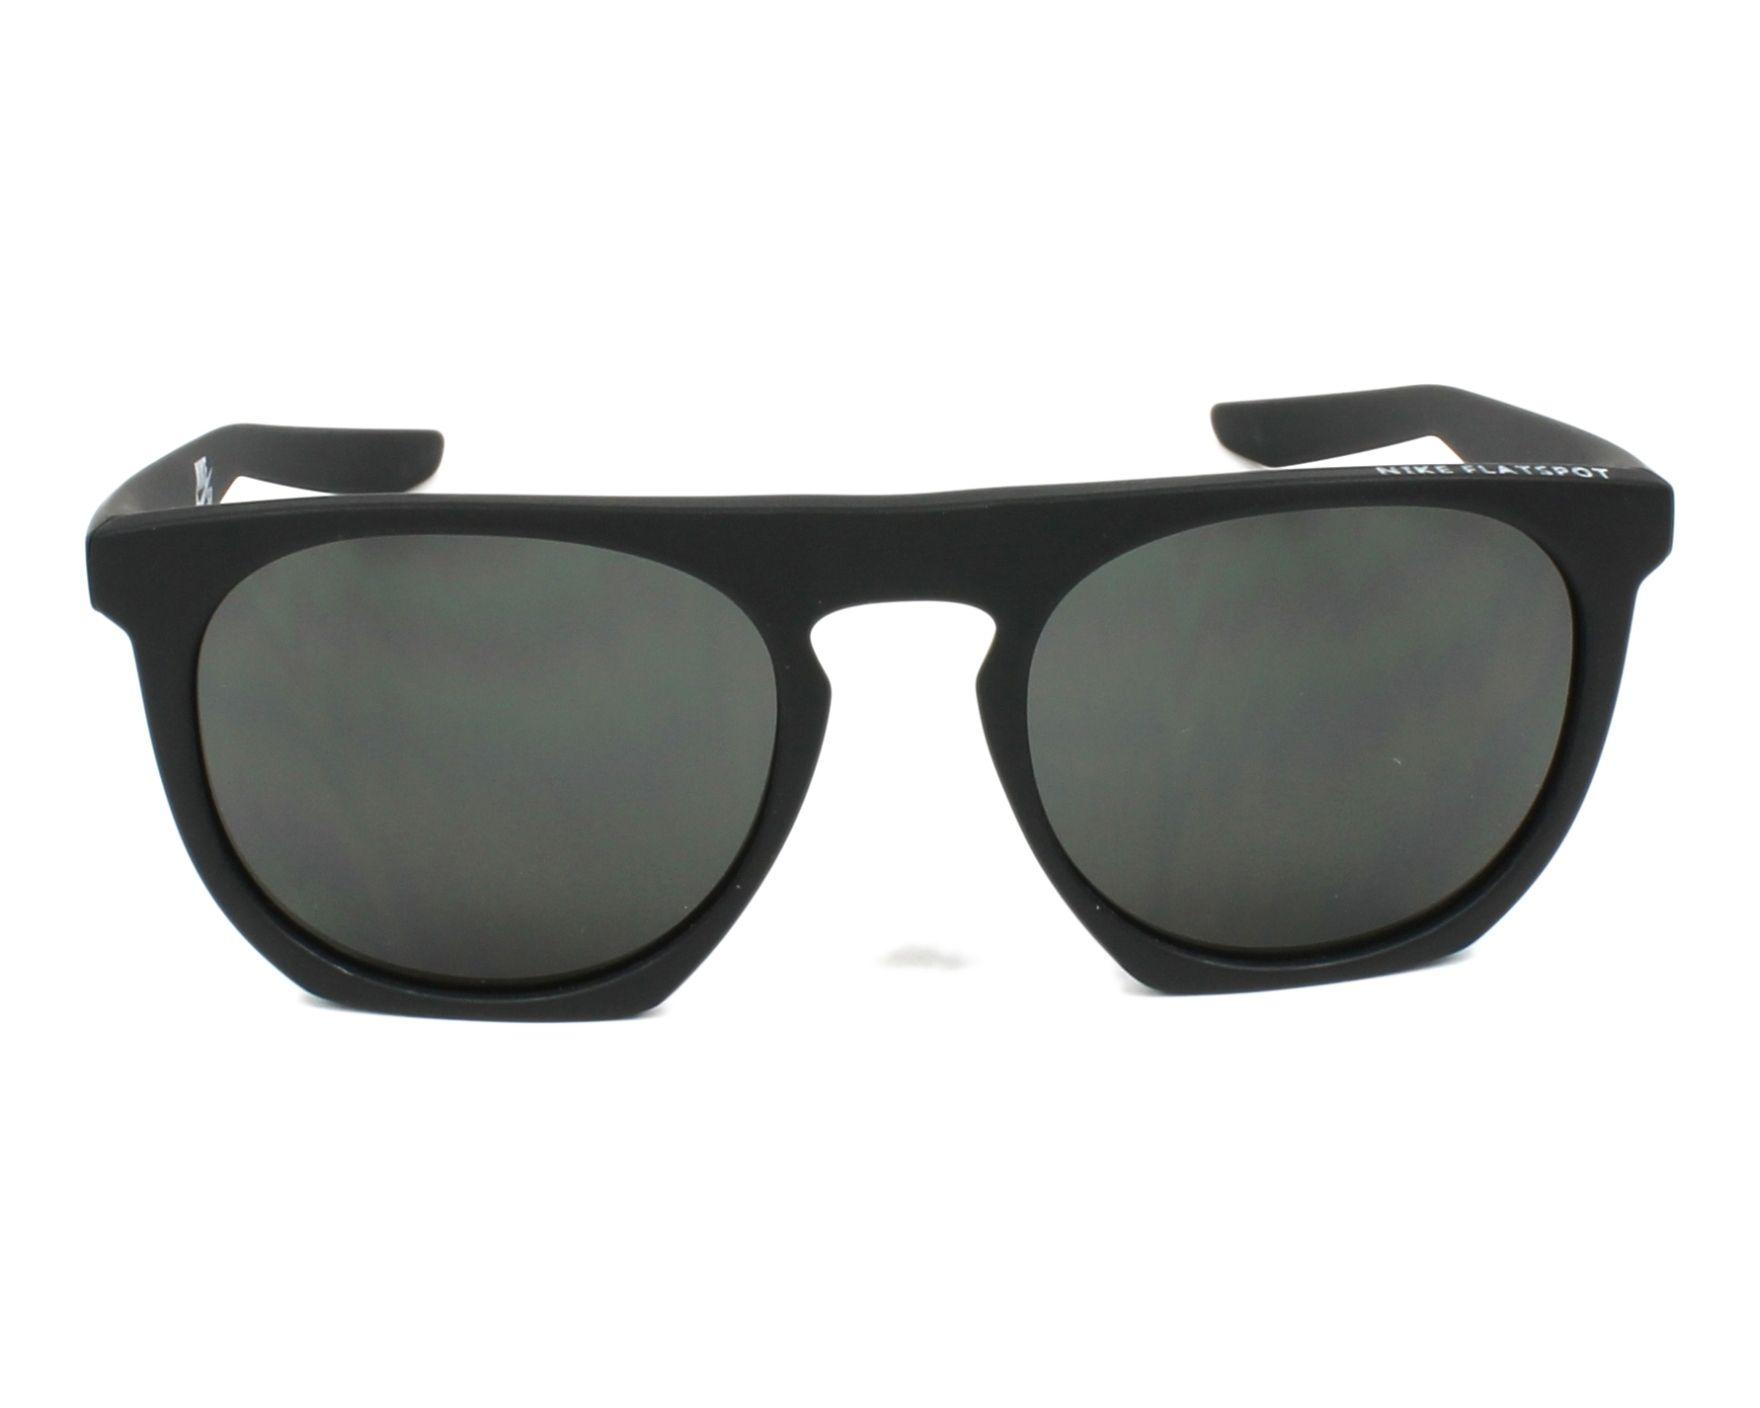 Sunglasses Nike EV-0923 002 - Anthracite front view ce4f76afca61